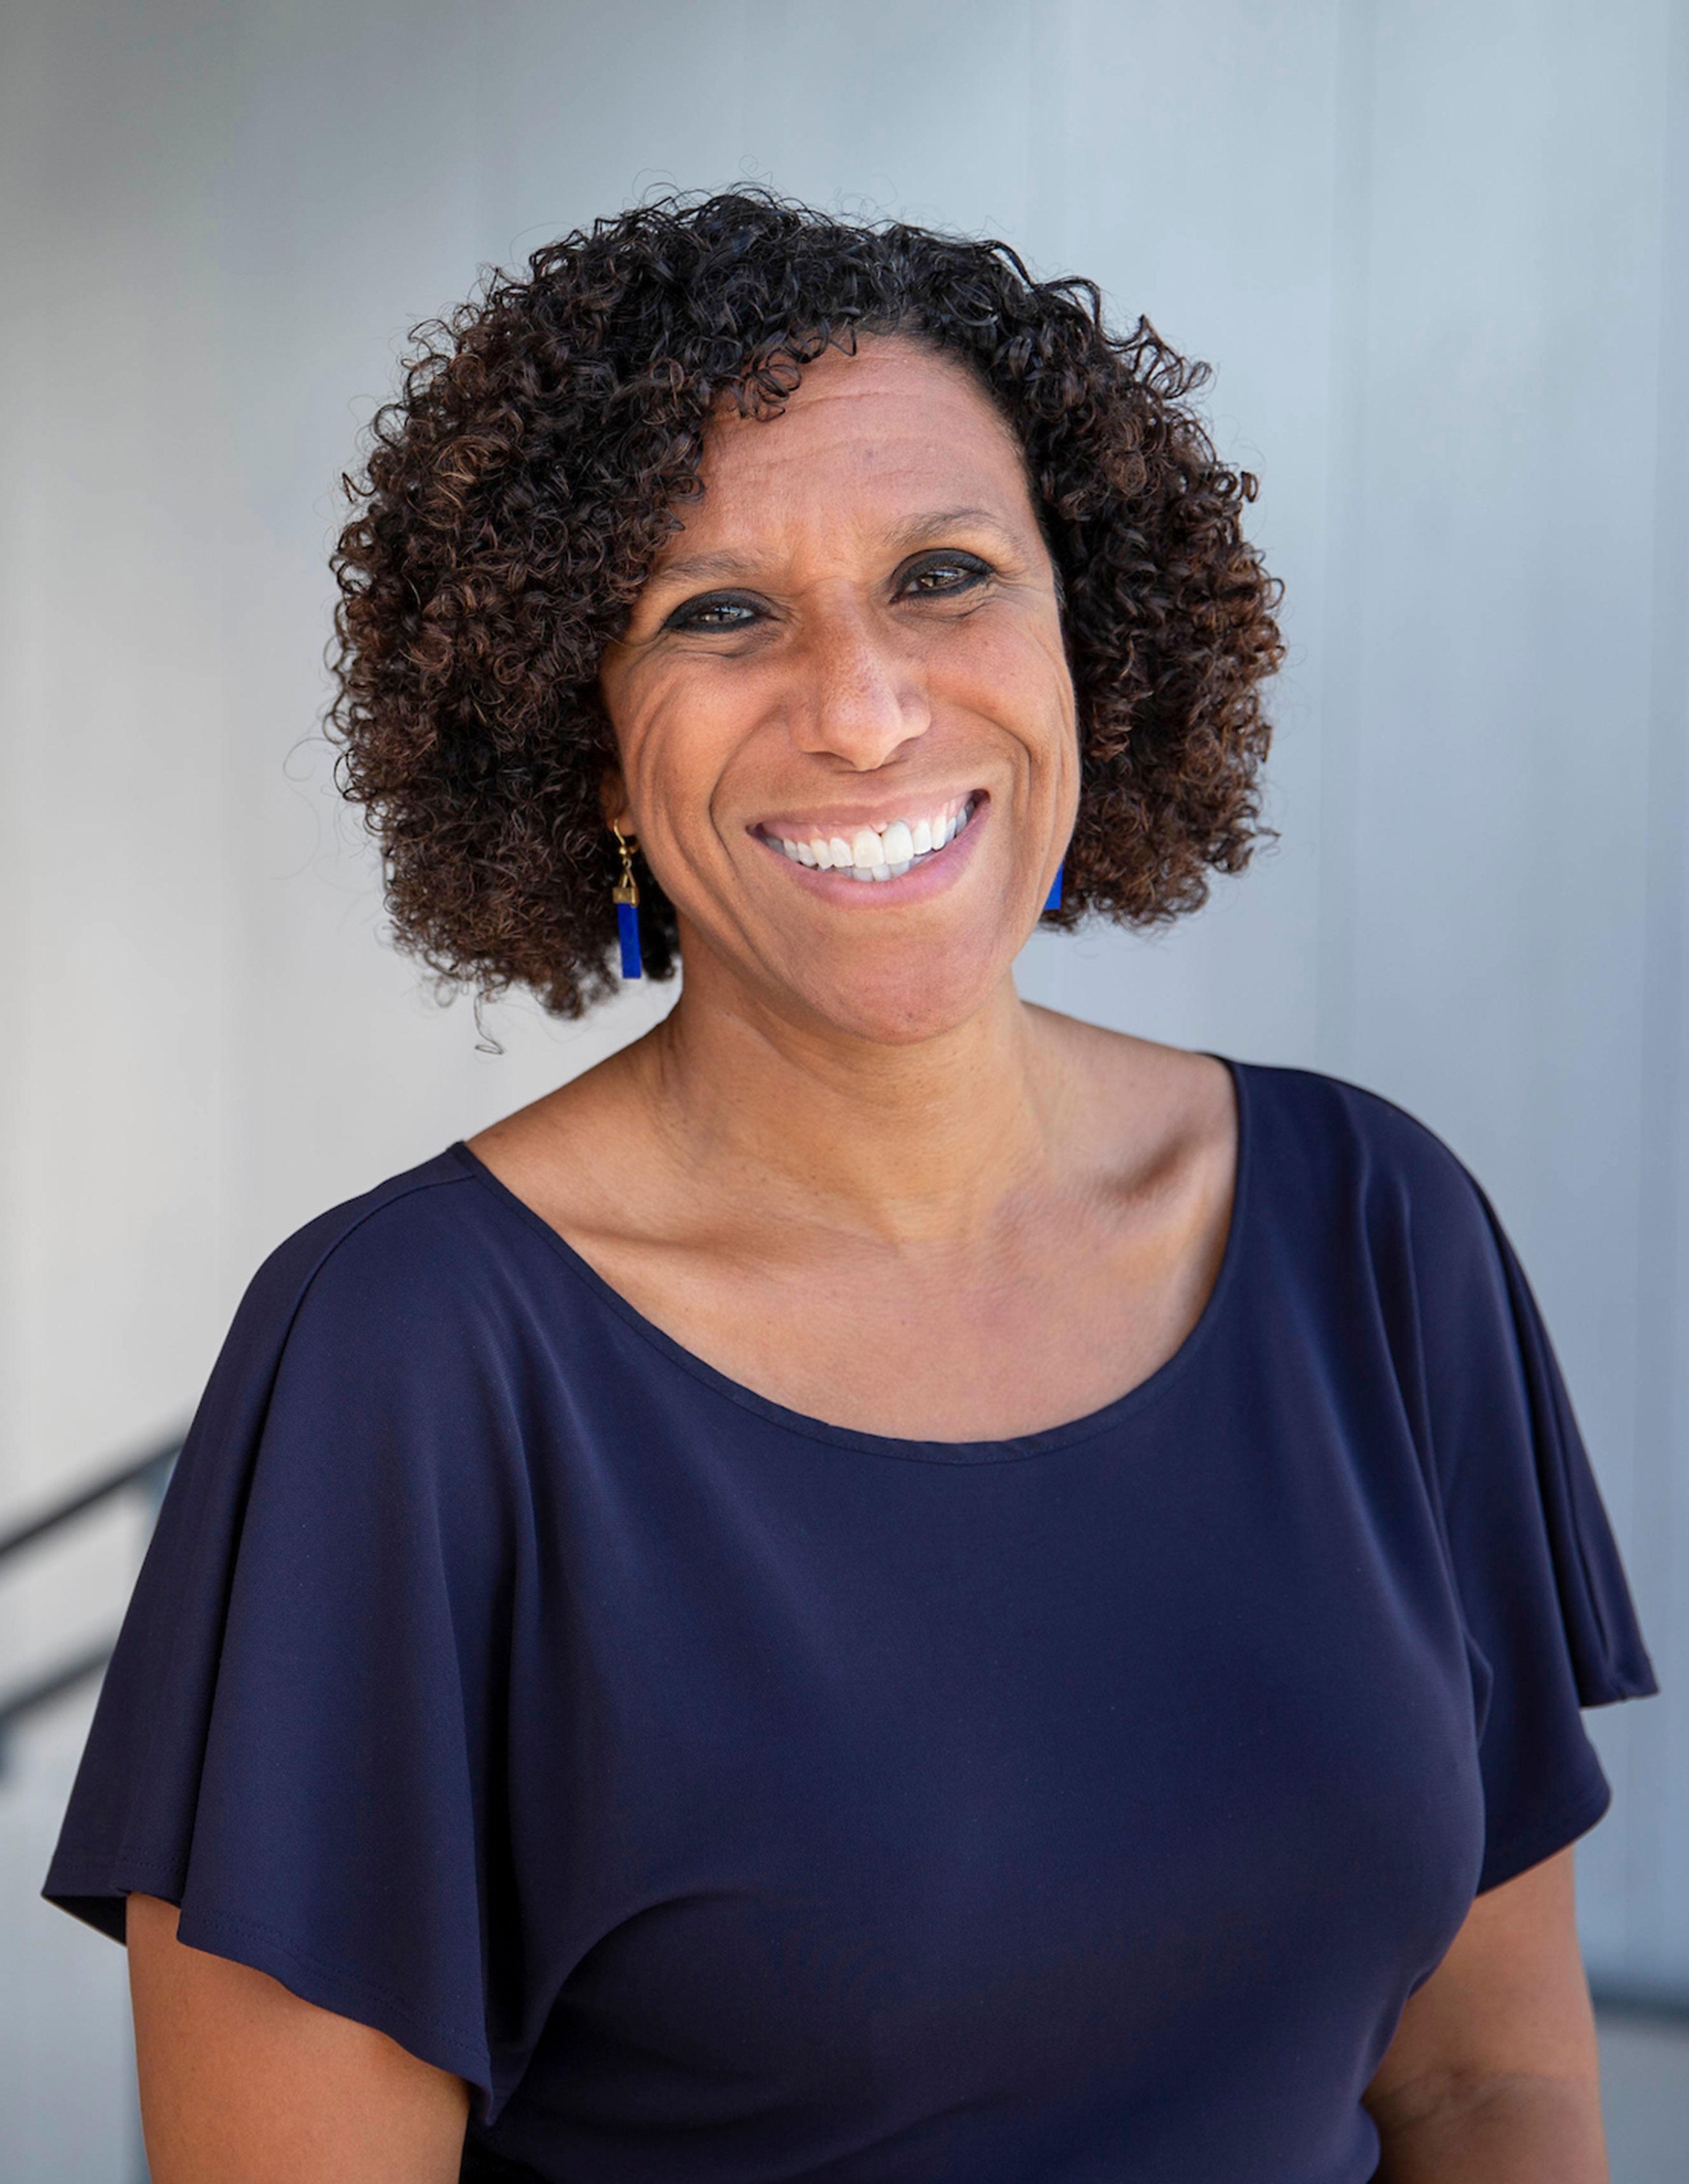 Headshot of ASU Professor Ayanna Thompson